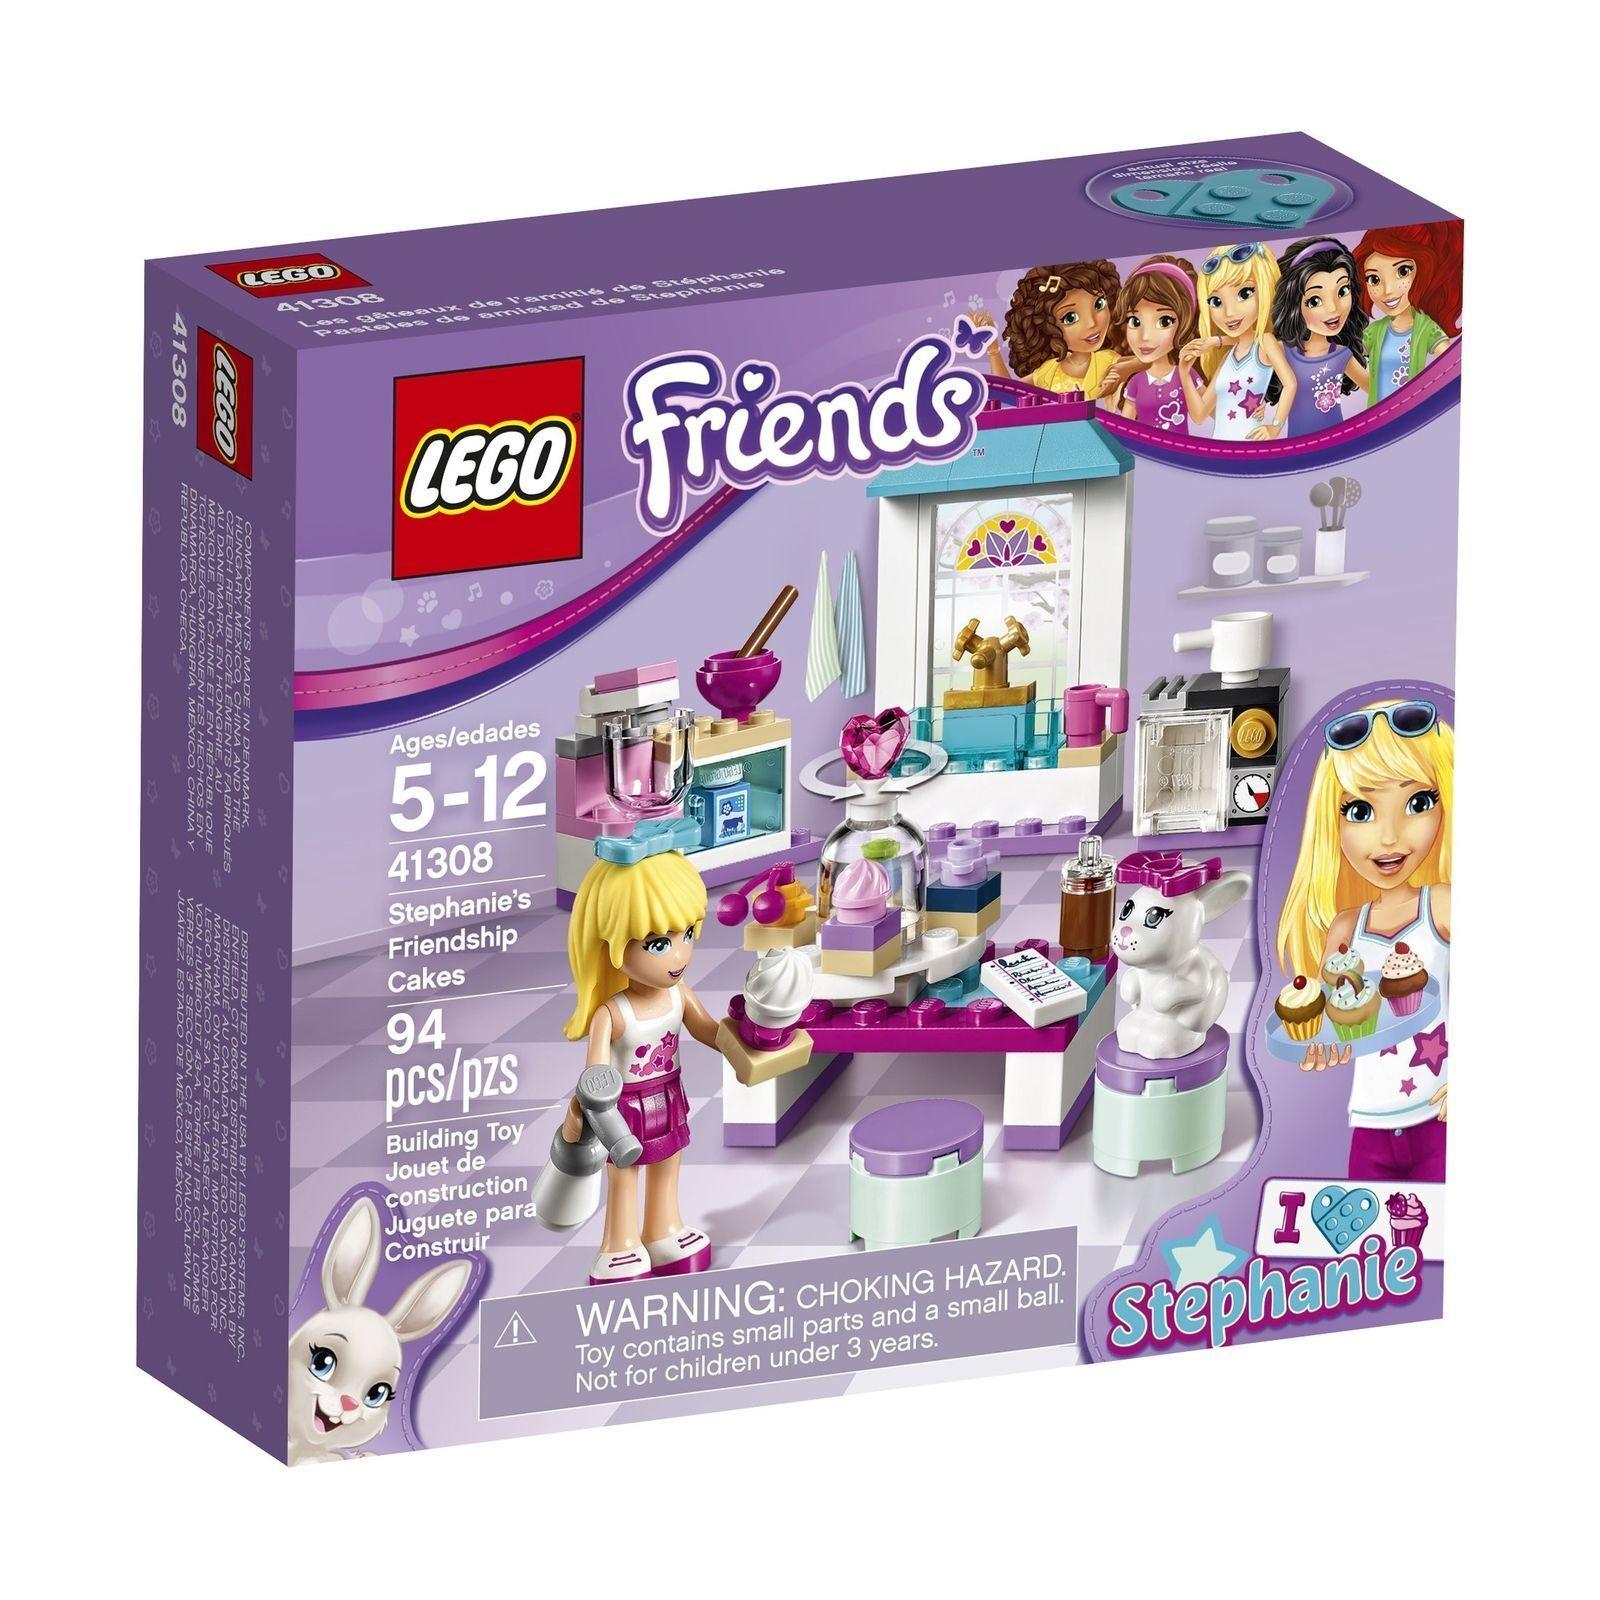 41308 STEPHANIE'S FRIENDSHIP CAKES cupcakes lego set NEW legos FRIENDS bakery